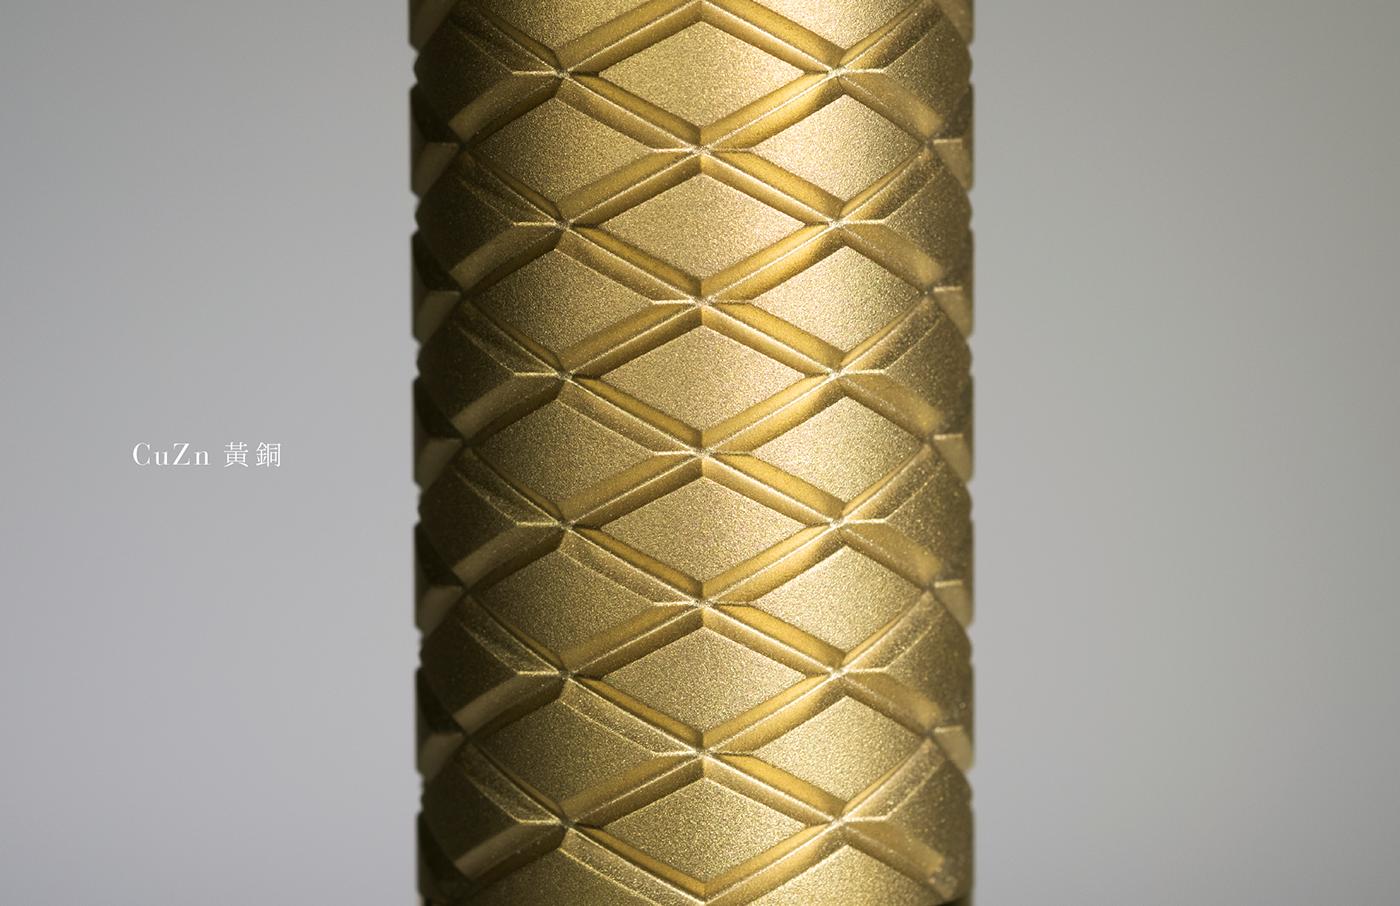 wind chime wind chime aluminum aluminium copper brass metal cnc acoustic